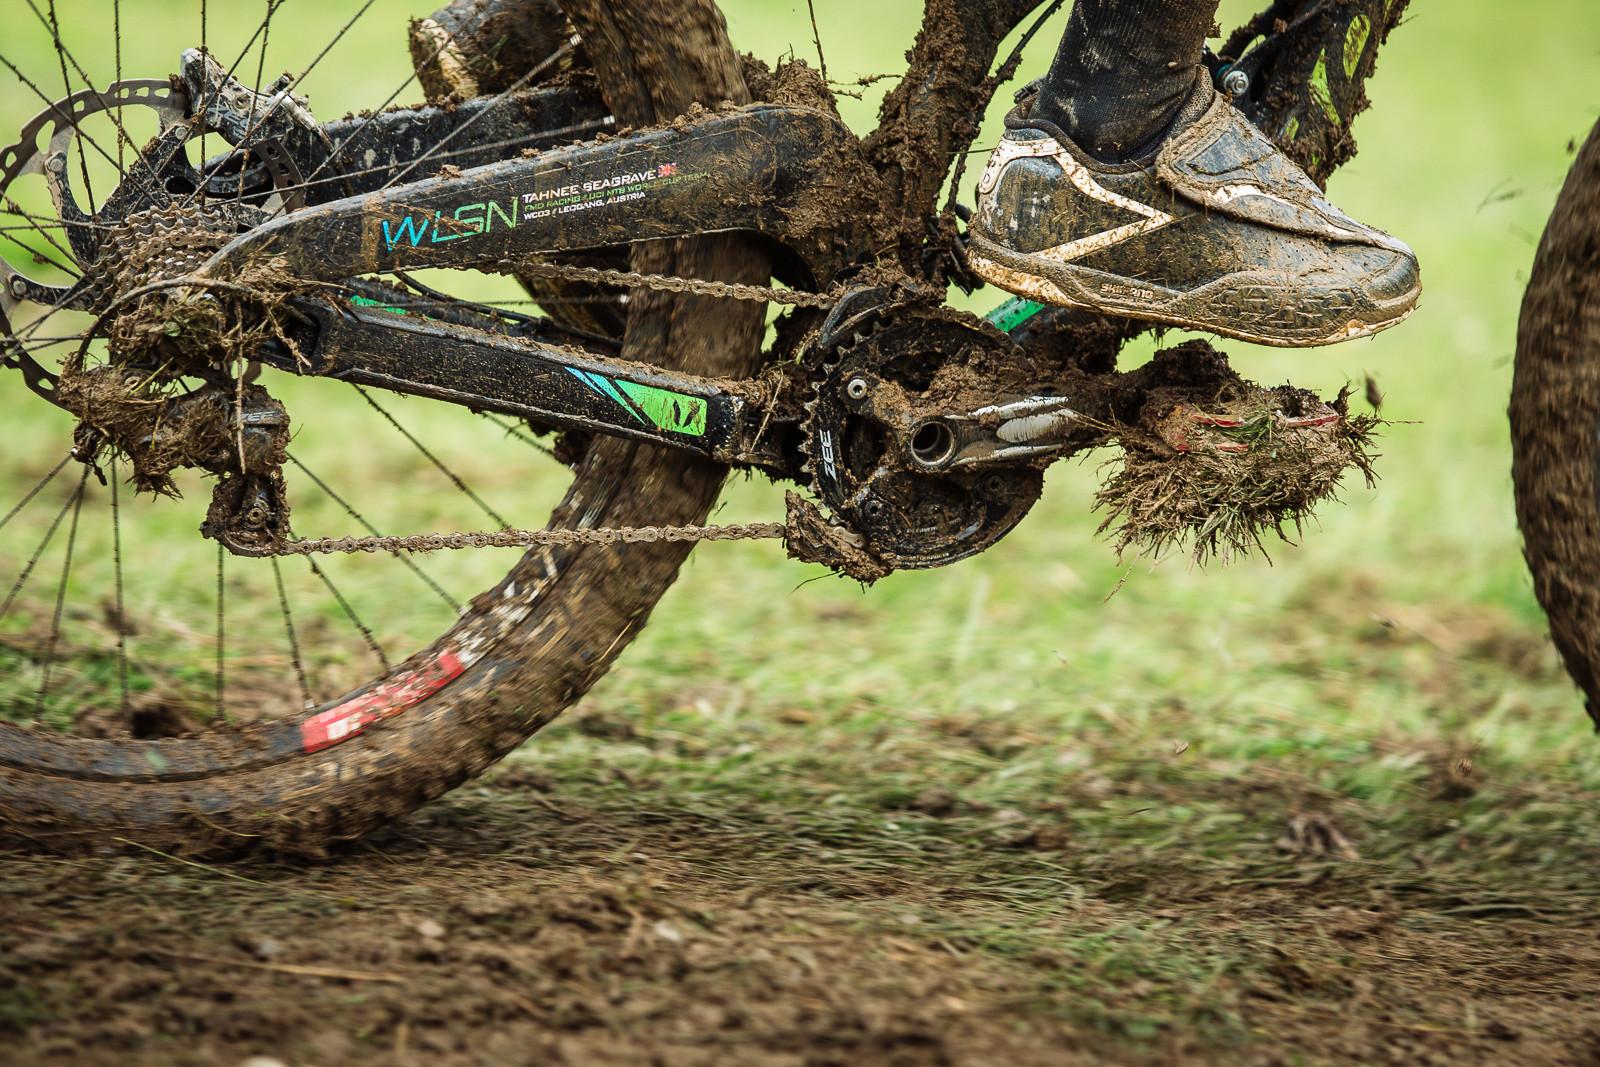 An Adventure in Conditions - British DH Series, Bala Race Report - RACE REPORT - 2015 British Downhill Series Bala - Mountain Biking Pictures - Vital MTB